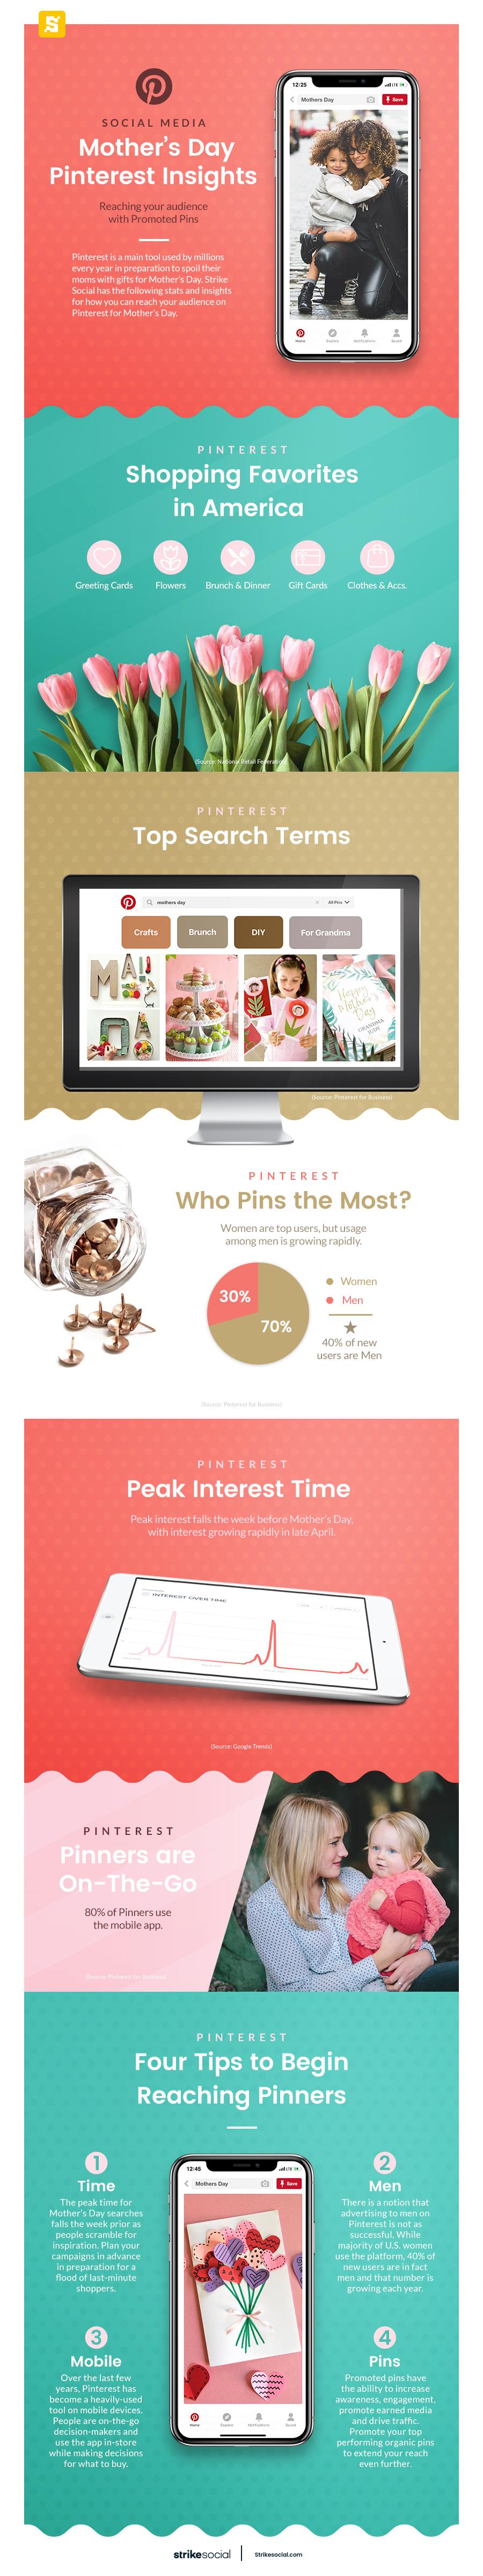 Pinterest Mother's Day infographic strike social 2018